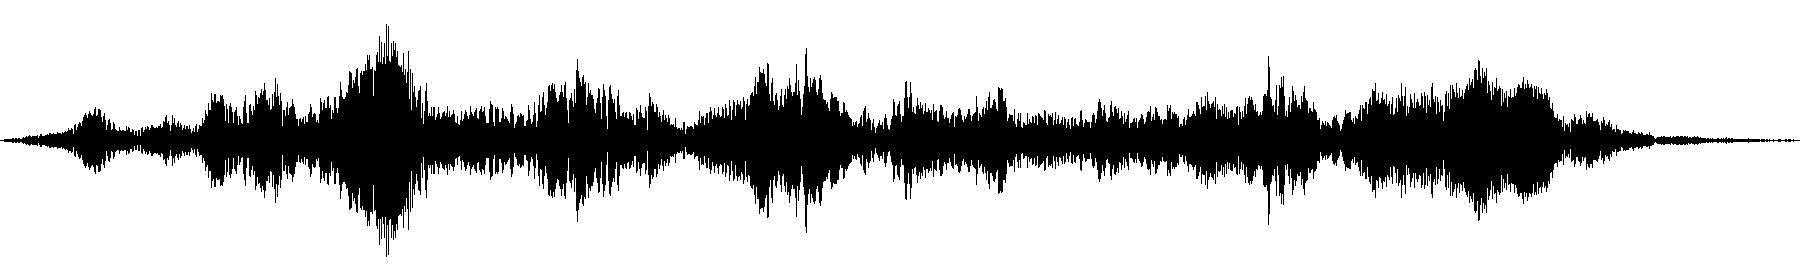 02.atmos